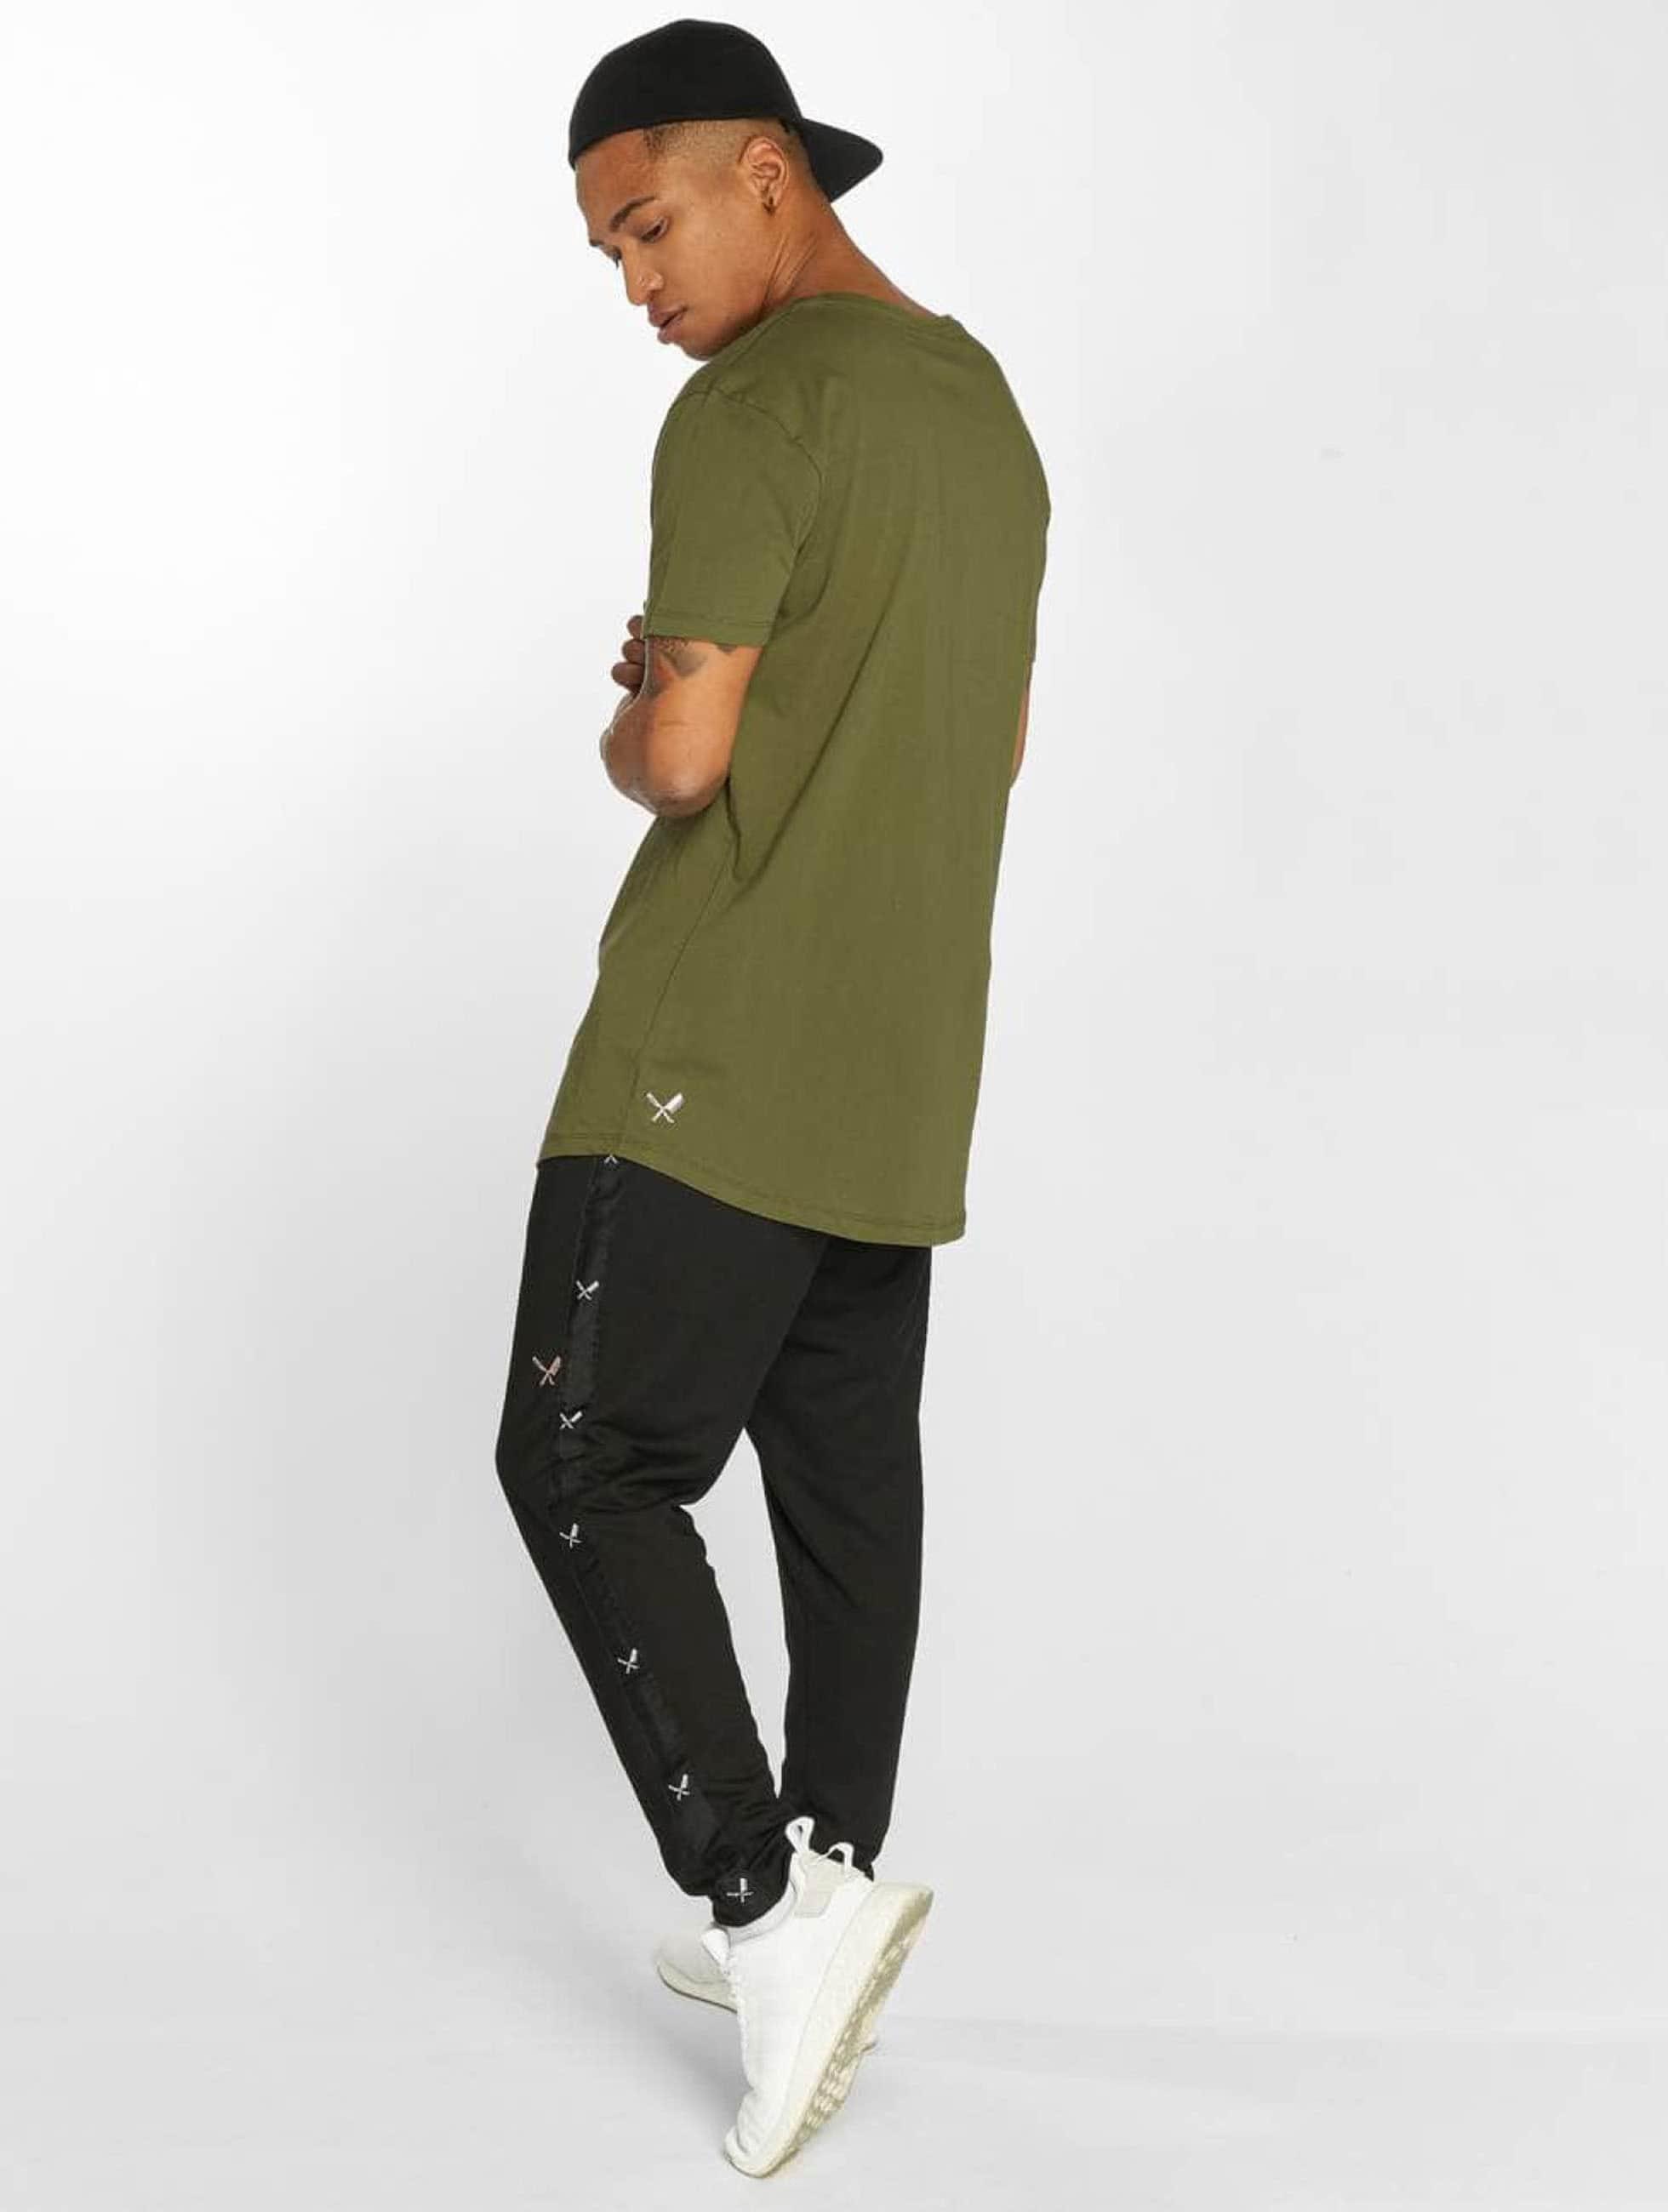 Distorted People T-skjorter BB Blades Camo oliven